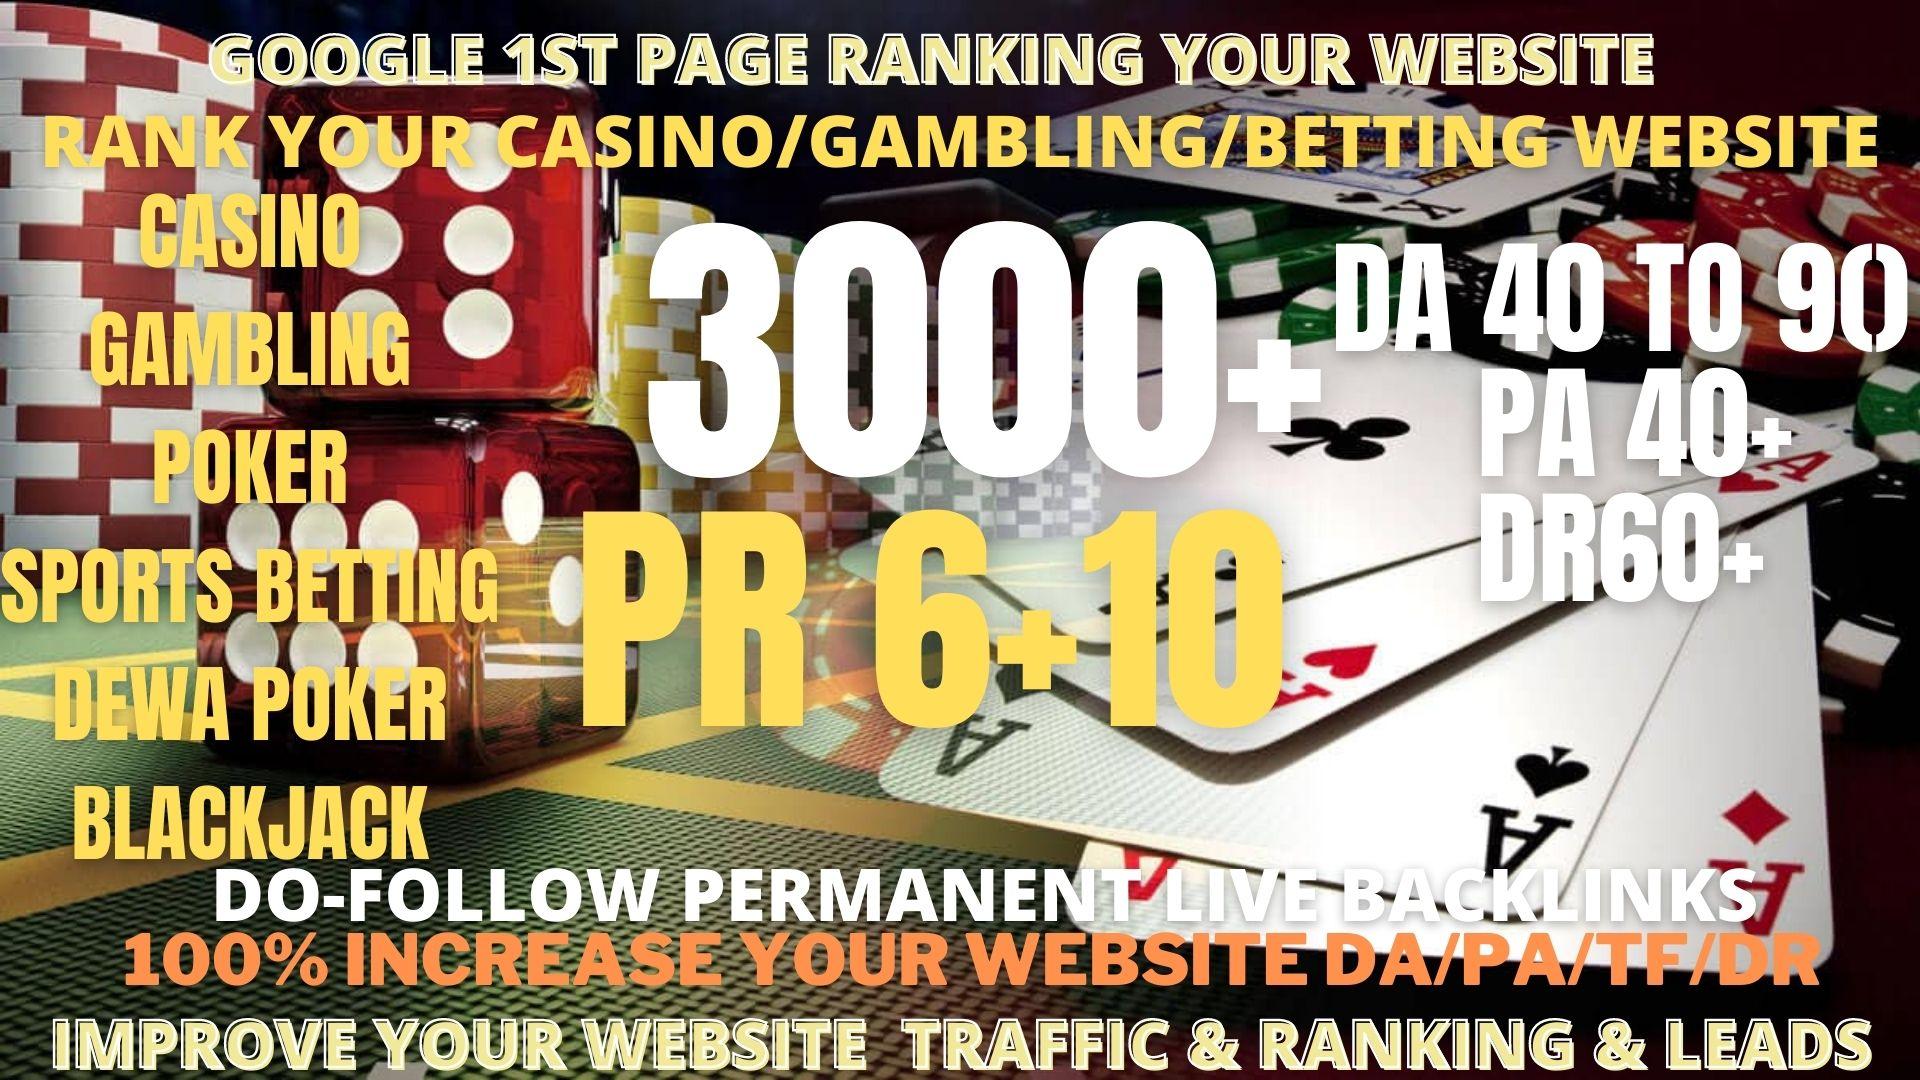 3000+Pbn powerfull Casino,  Gambling,  Poker,  Sports Betting High Quality Web2.0 Backlinks